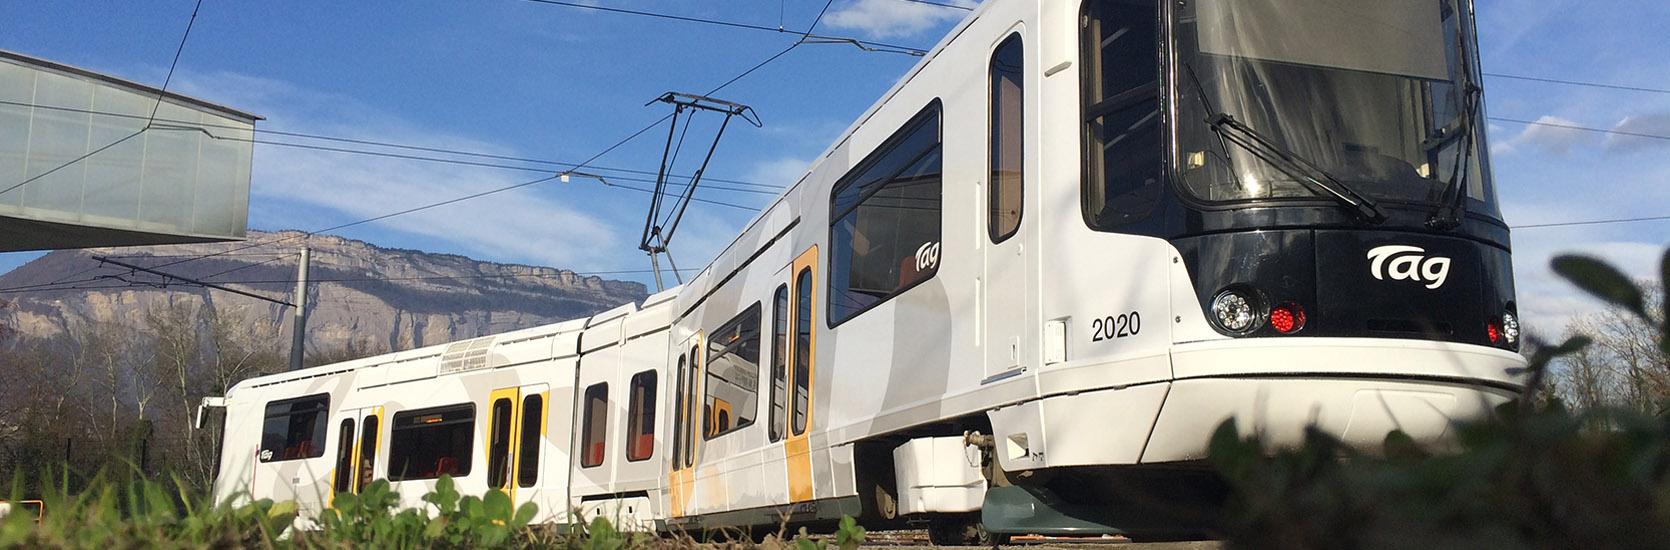 slider-1-tram